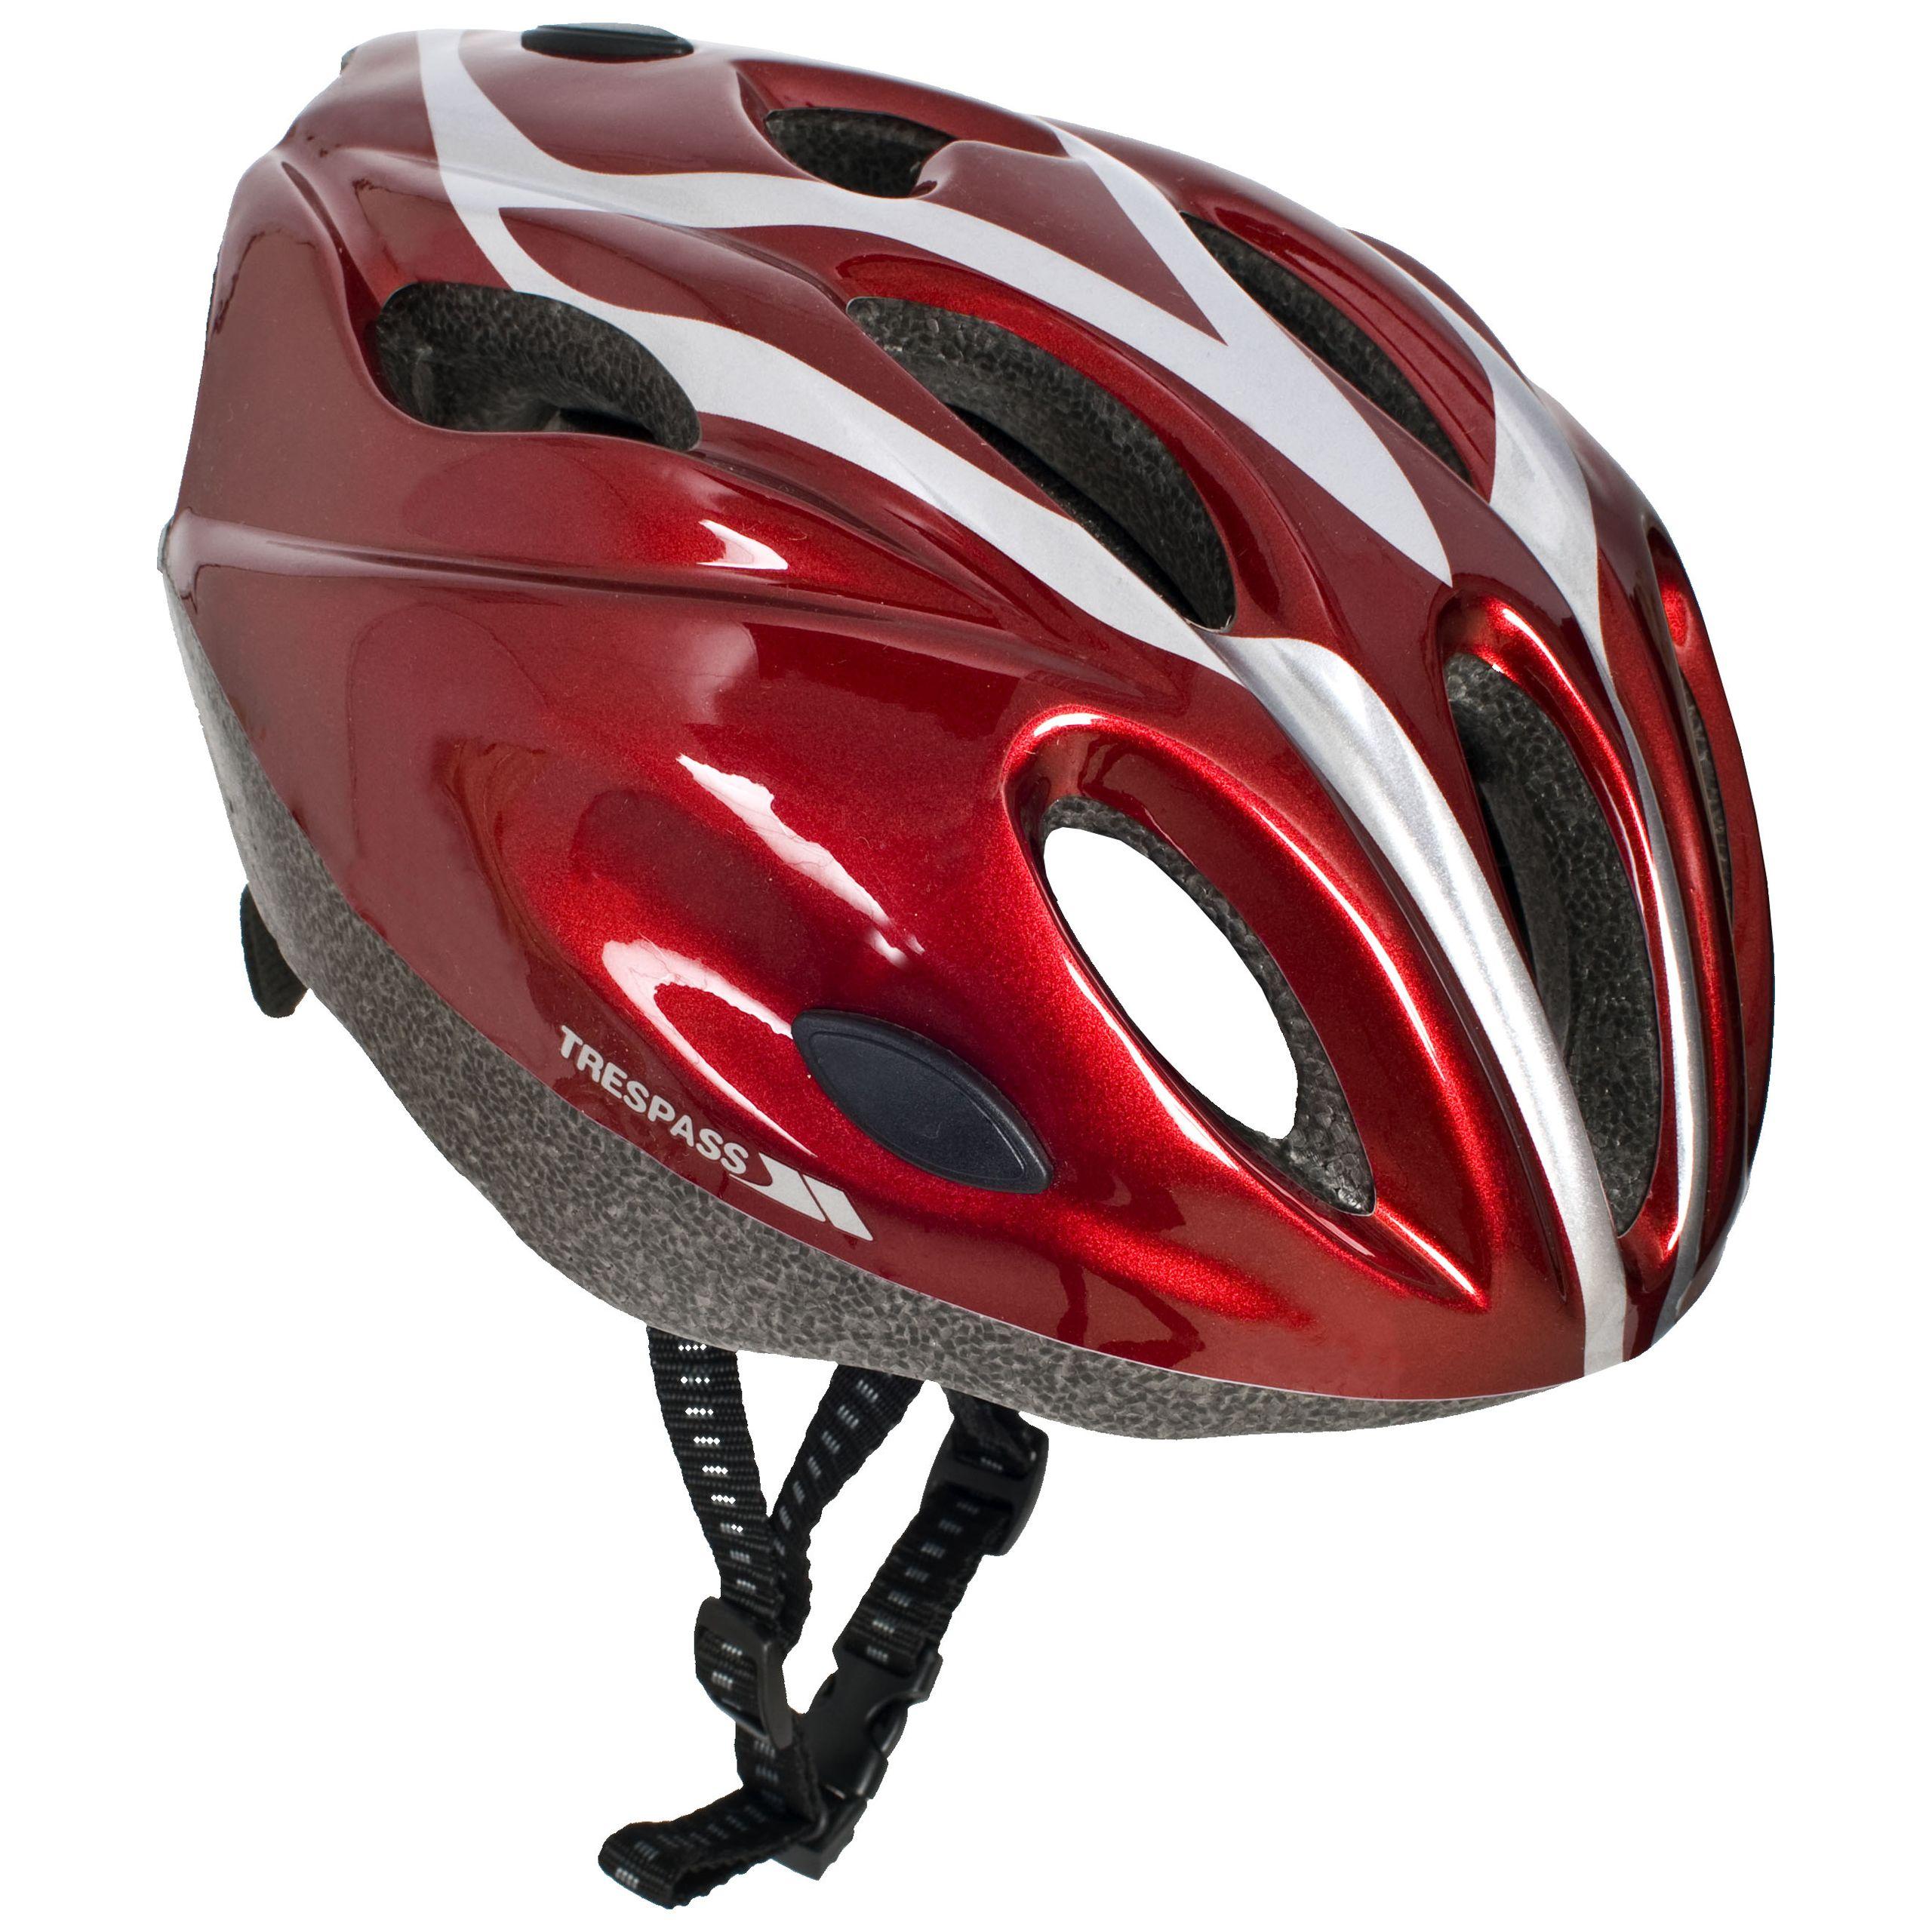 Tanky Red Kids Bike Helmet